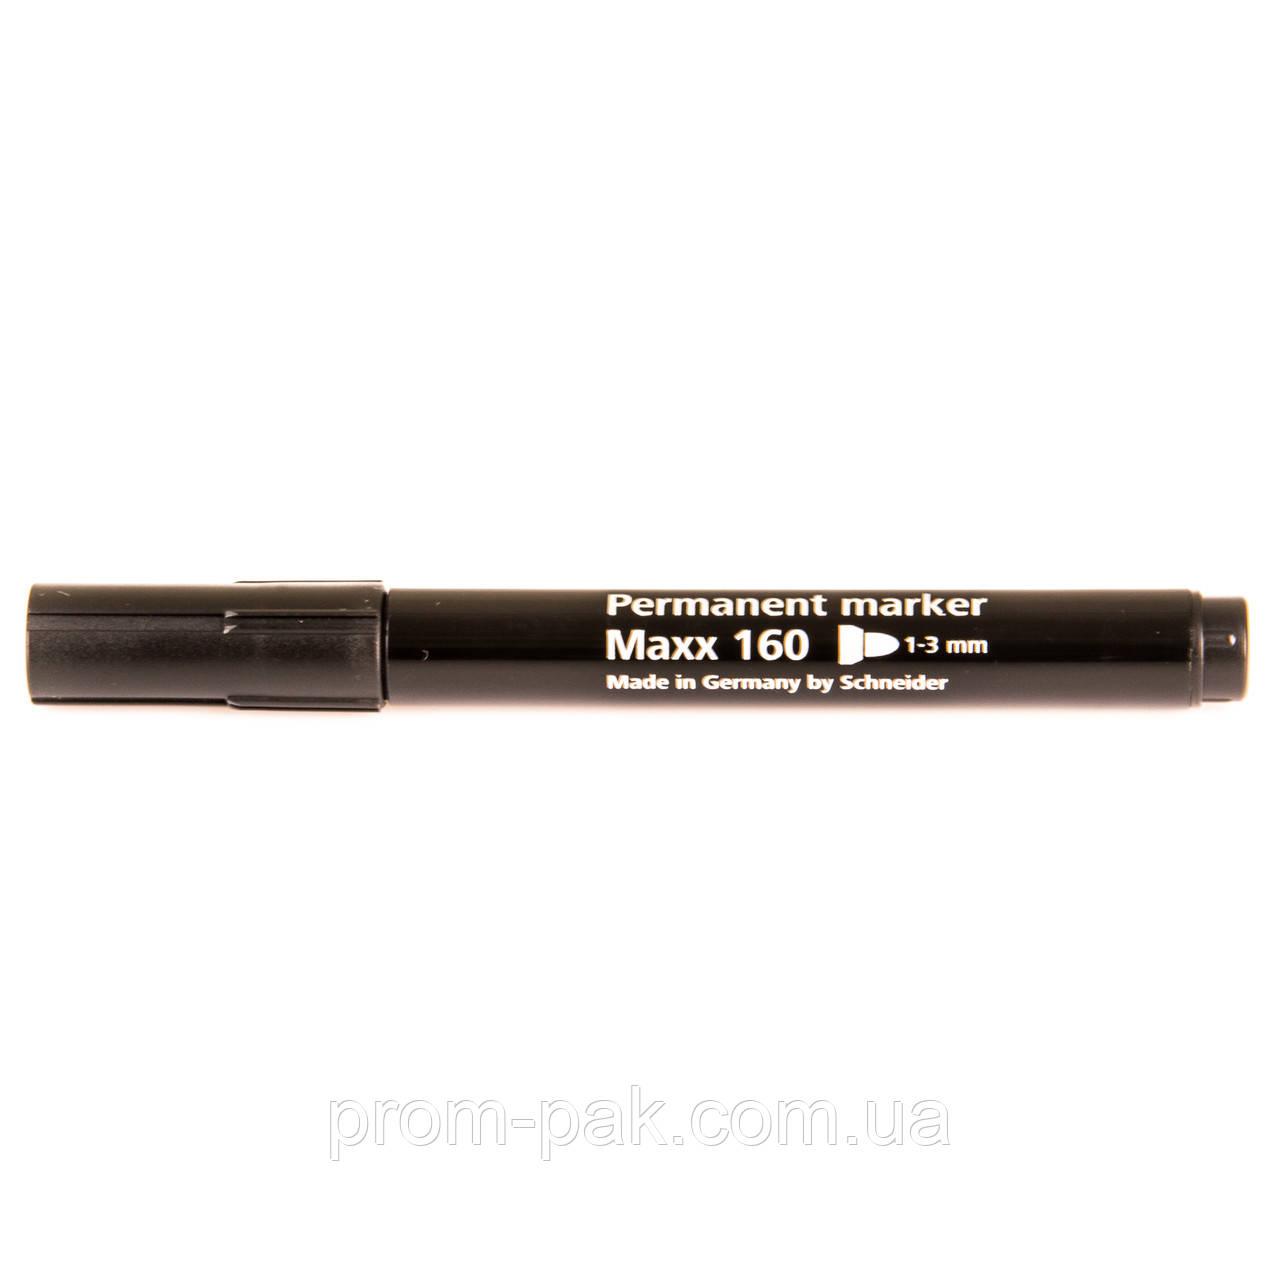 Черный маркер перманентный Schneider MAXX 160 E